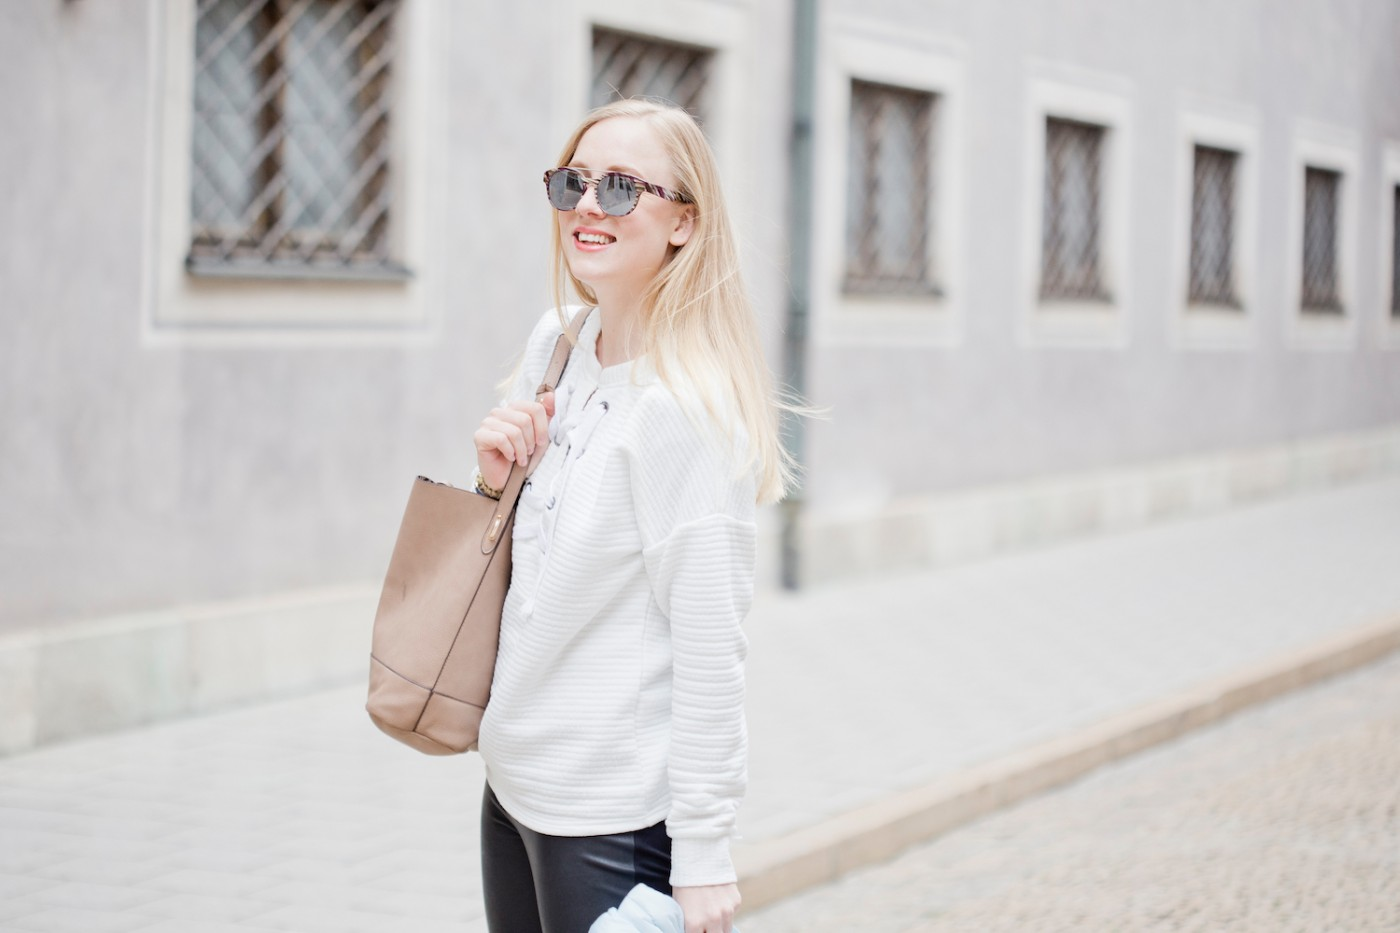 jjott daunenjacke übergangsjacke italia independent sunglasses